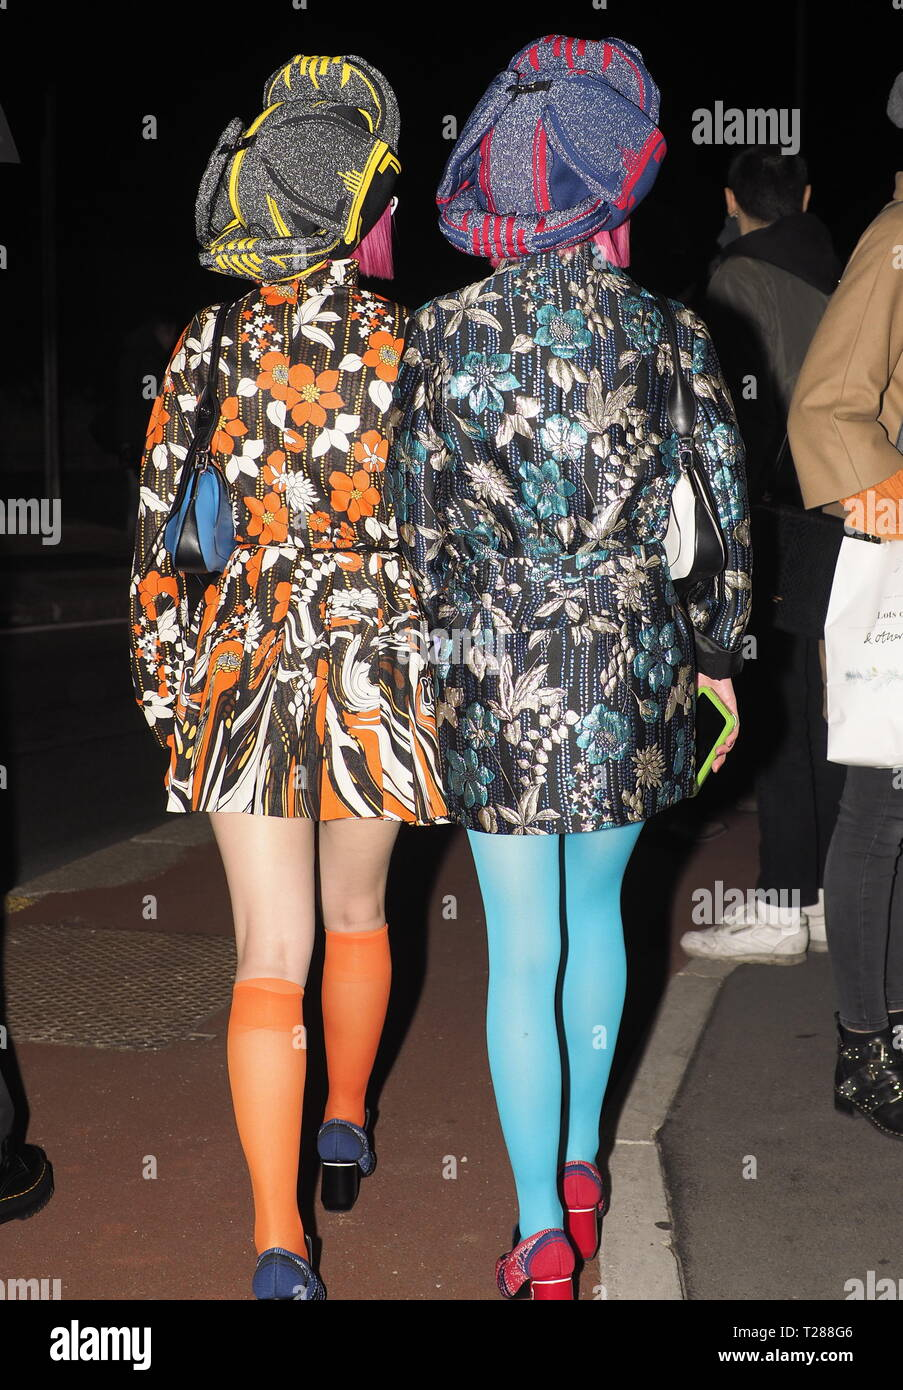 Milan Italy 13 January 2019 Aya And Ami Amiaya Street Style Outfits Before Prada Fashion Show During Milano Fashion Week Man Fall Winter 2019 2020 Stock Photo Alamy